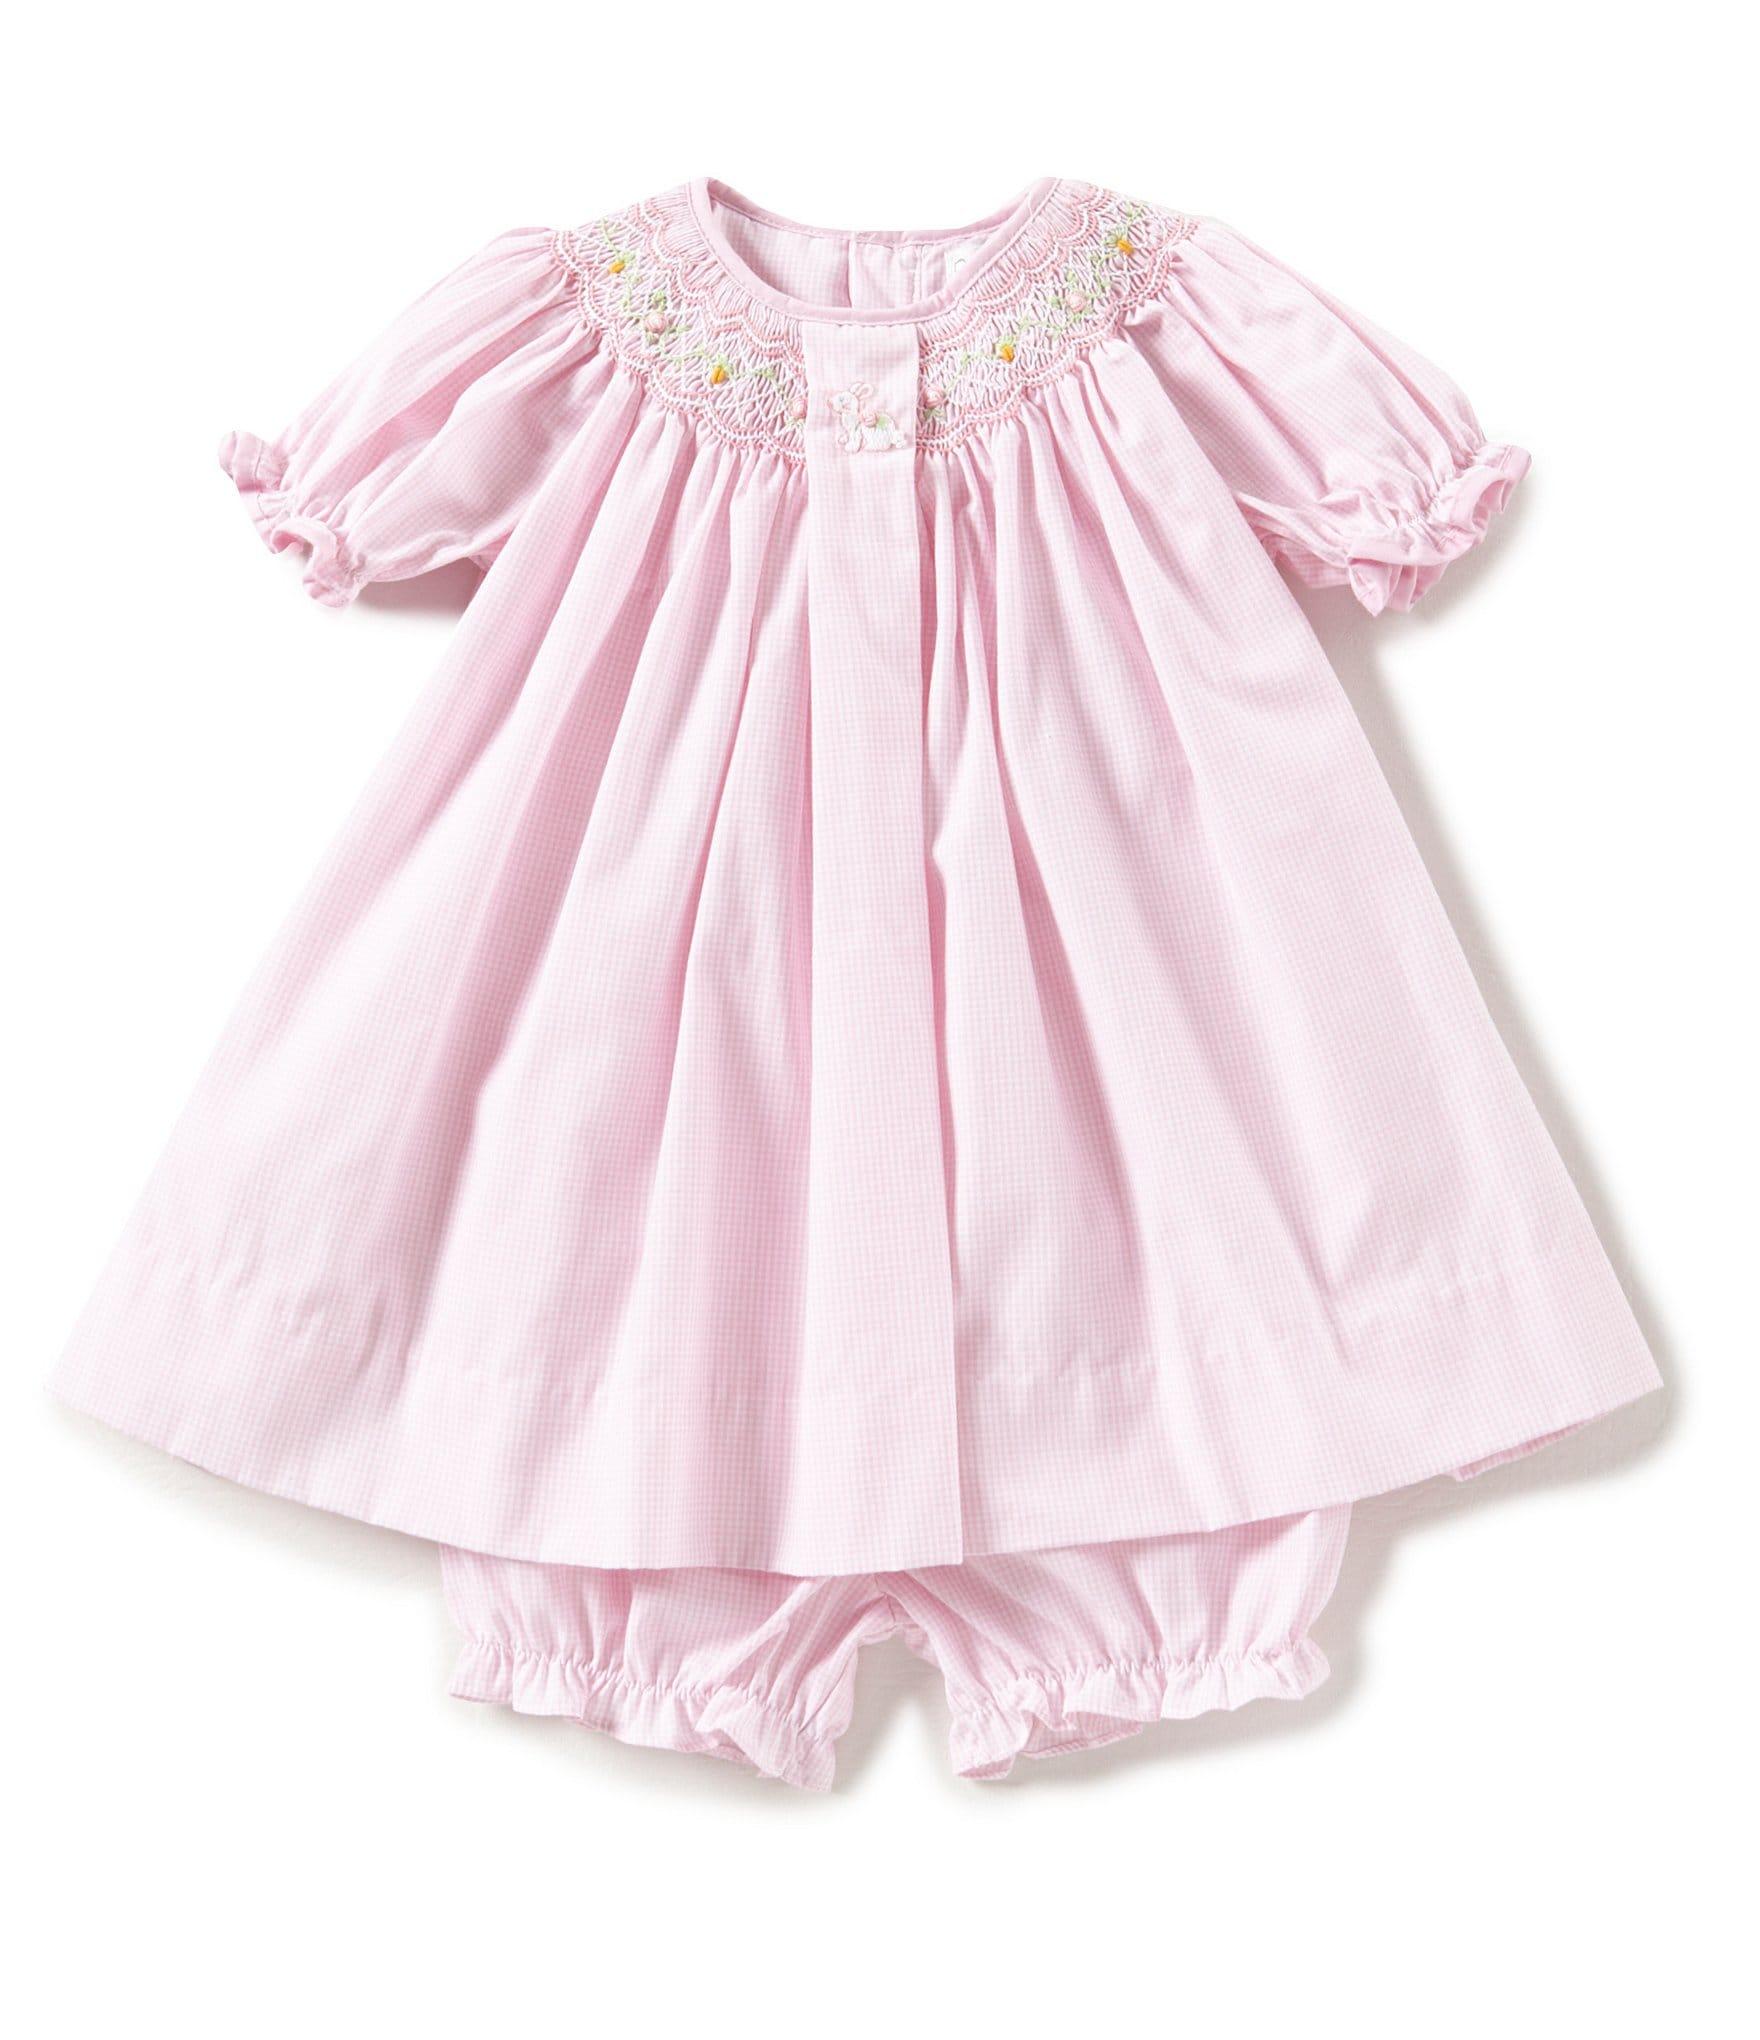 Petit Ami Baby Girls Newborn 24 Months Easter Bunny